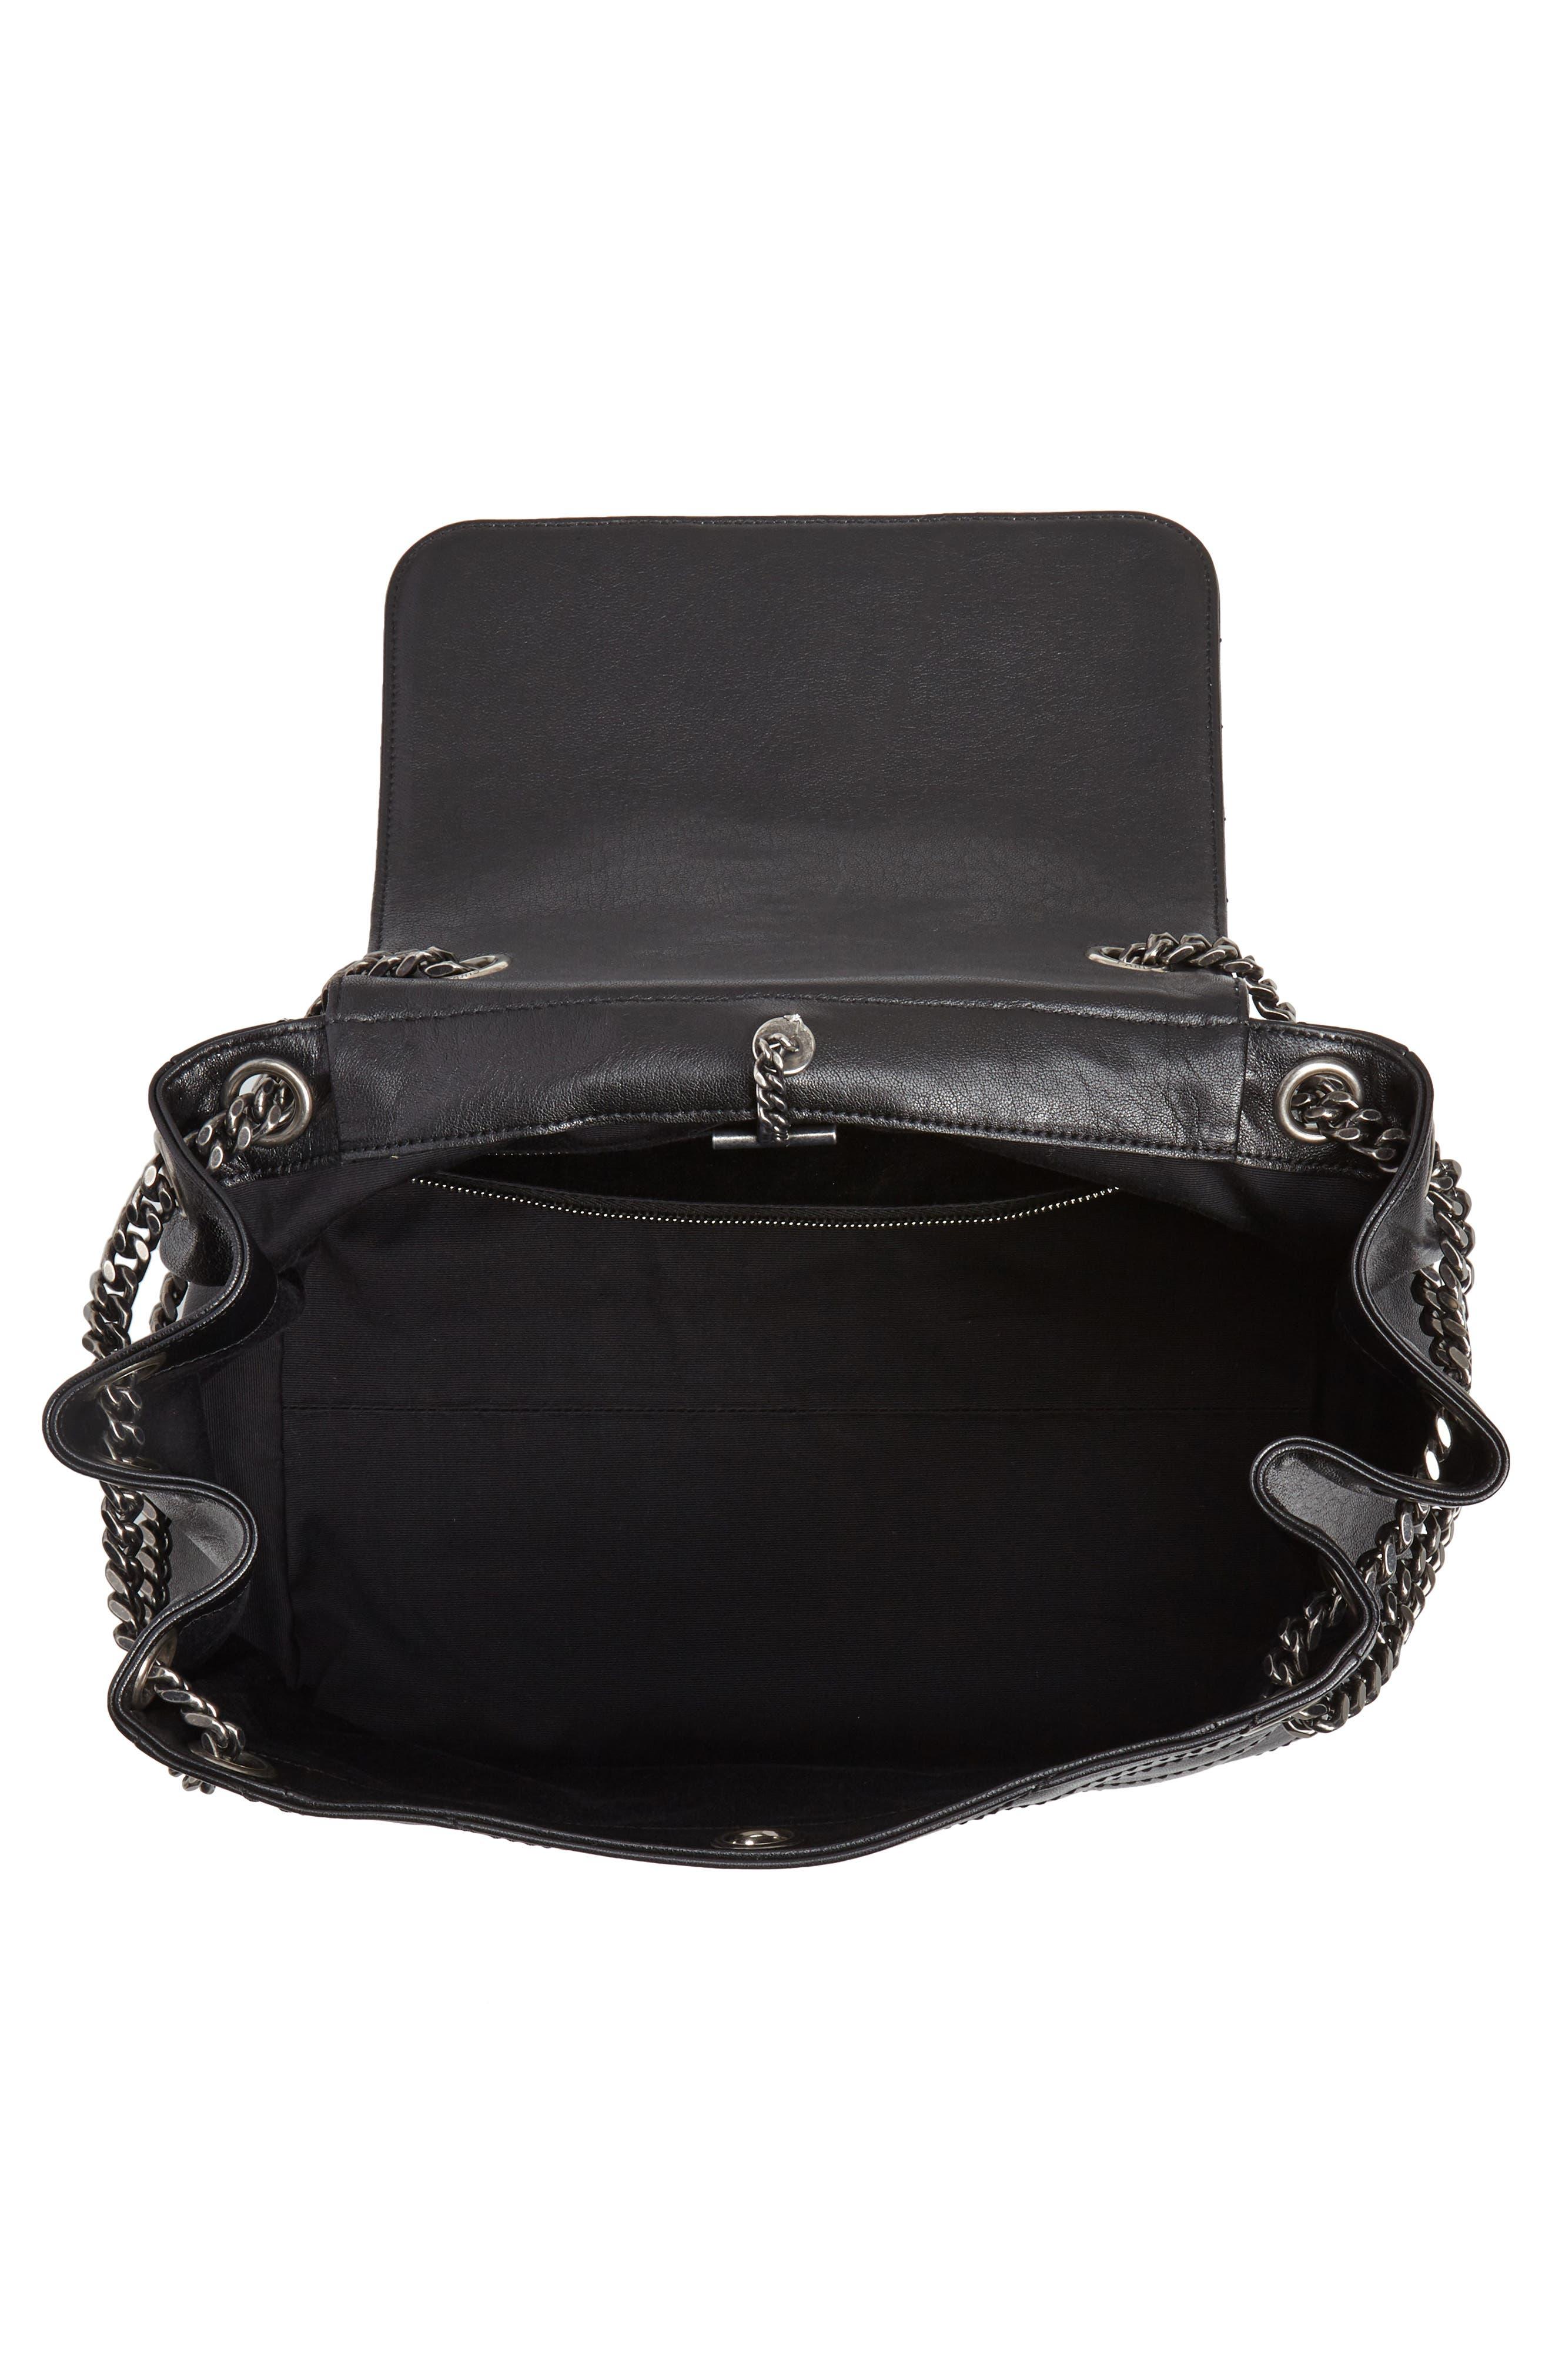 Nolita Large Leather Shoulder Bag,                             Alternate thumbnail 4, color,                             NOIR